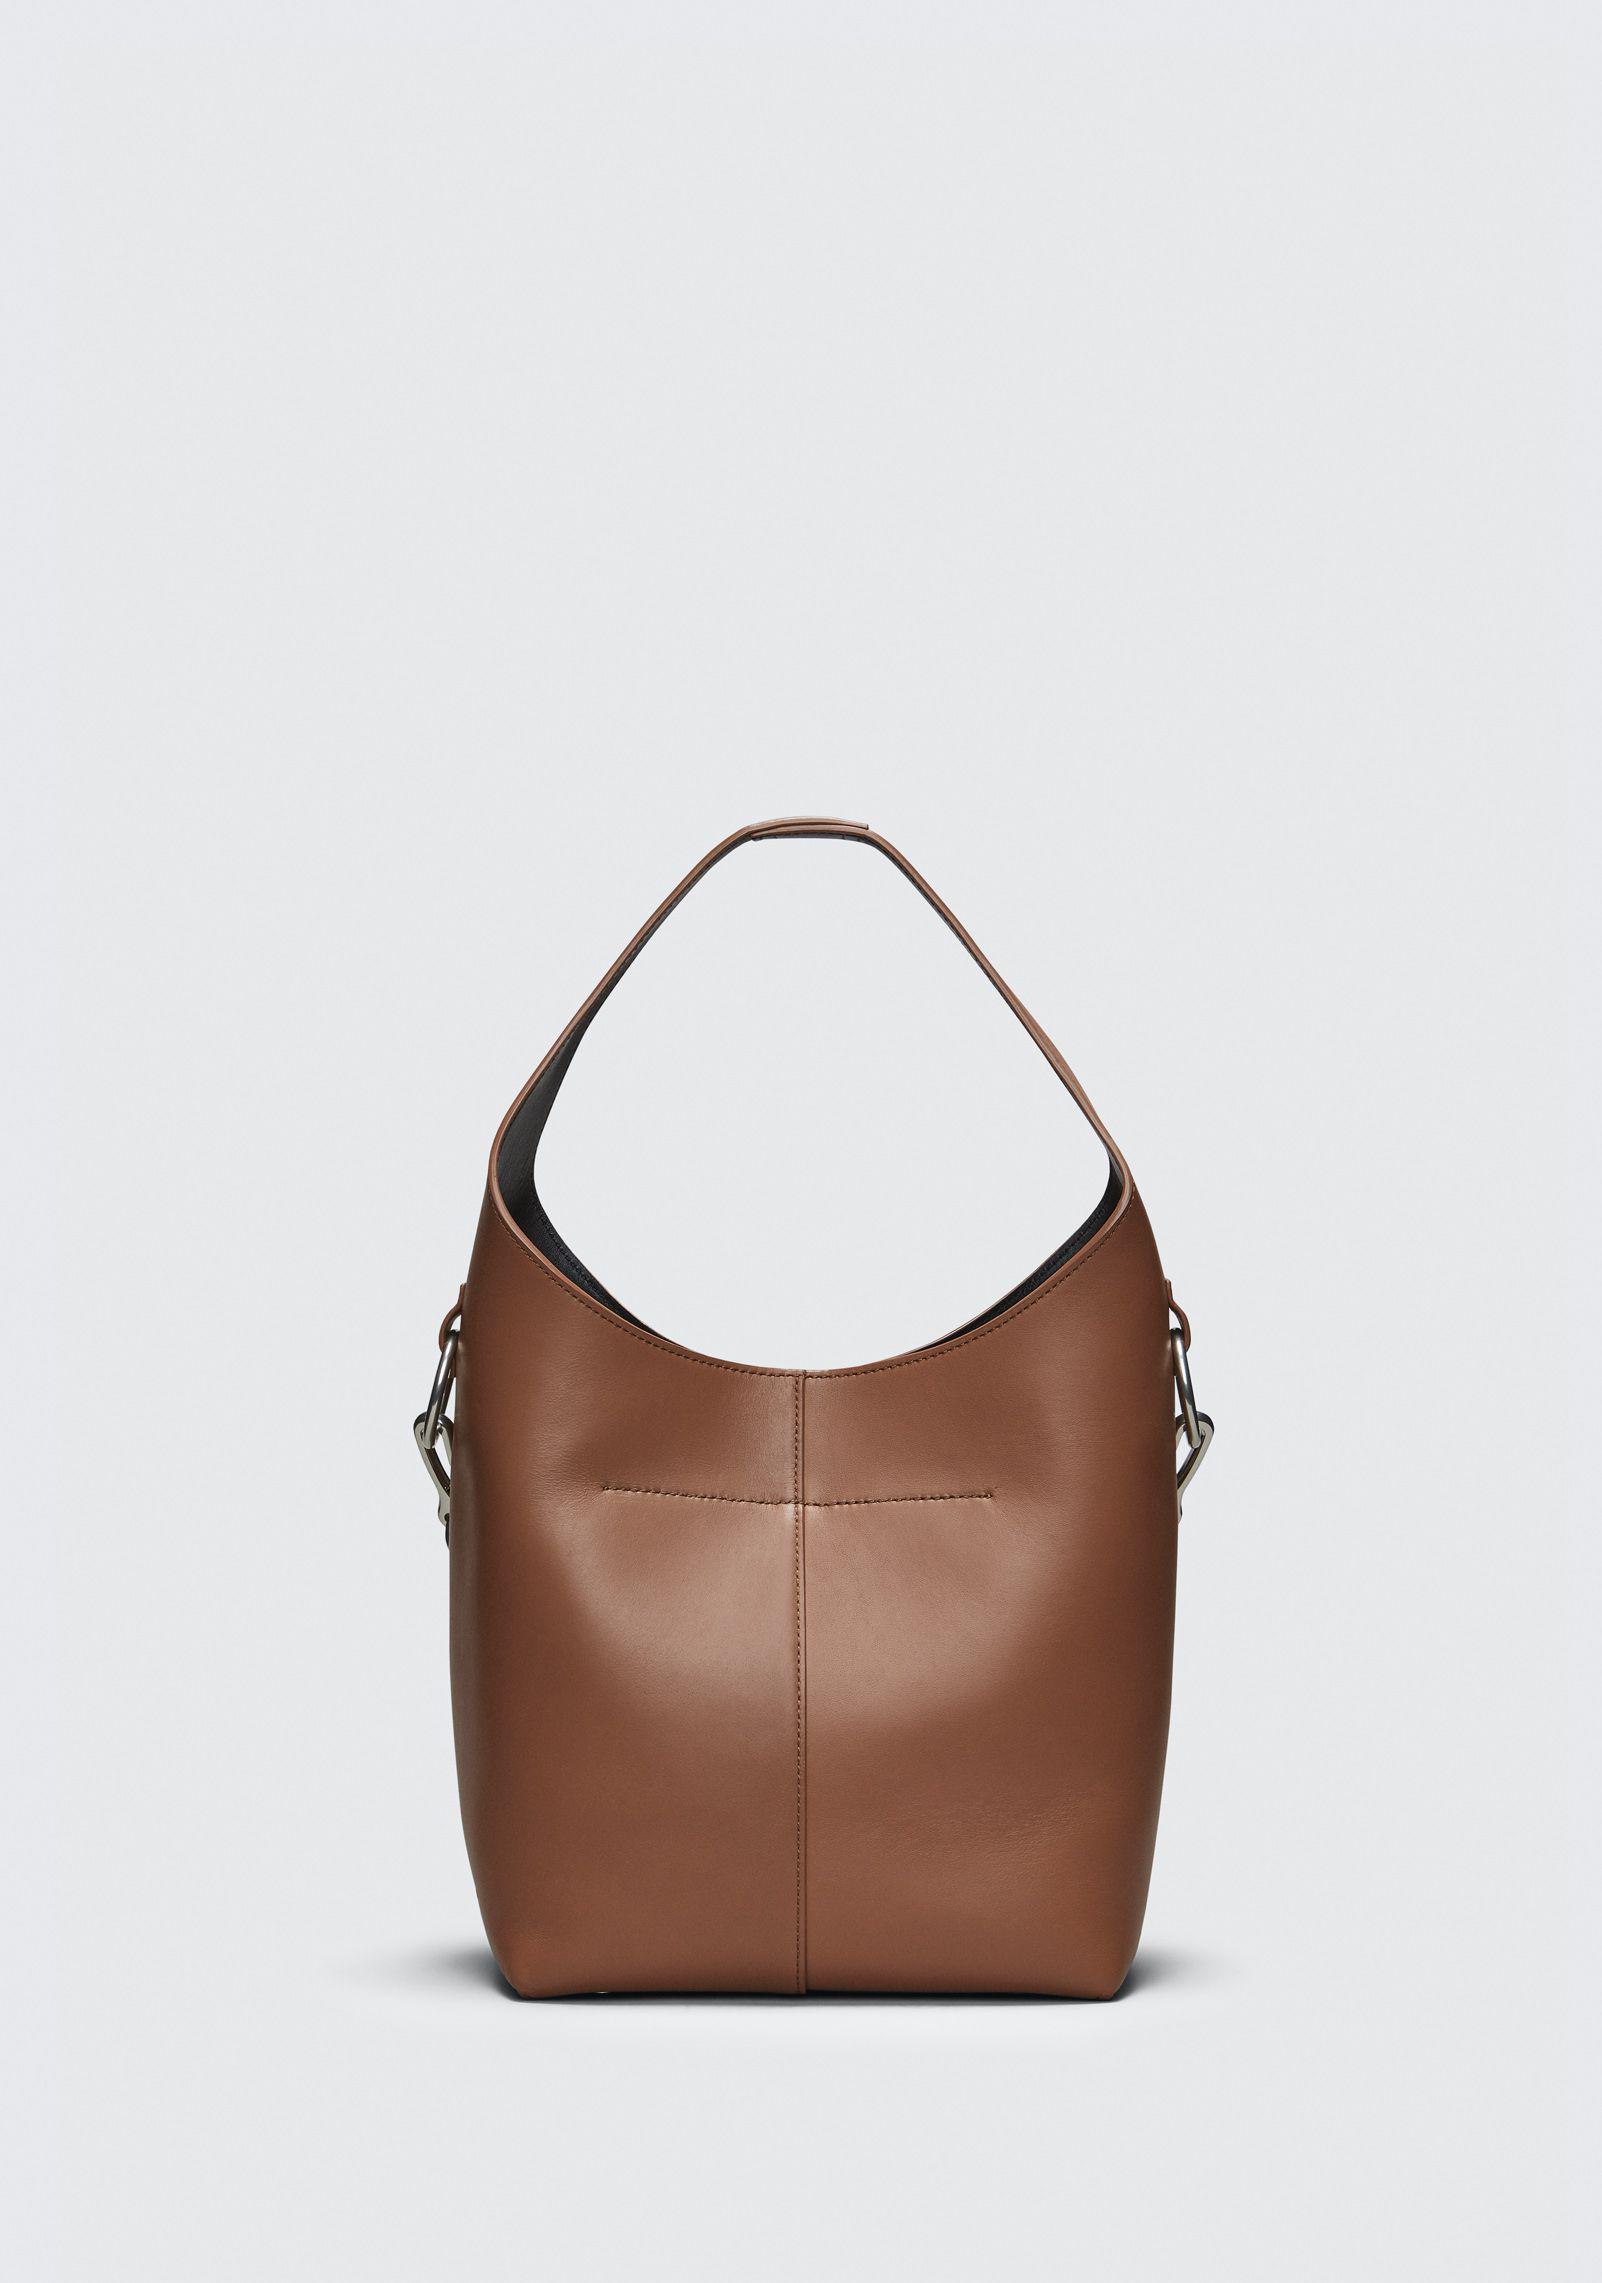 Genesis Mini Hobo Bag in Washed Denim Calfskin Alexander Wang L7tNC0d